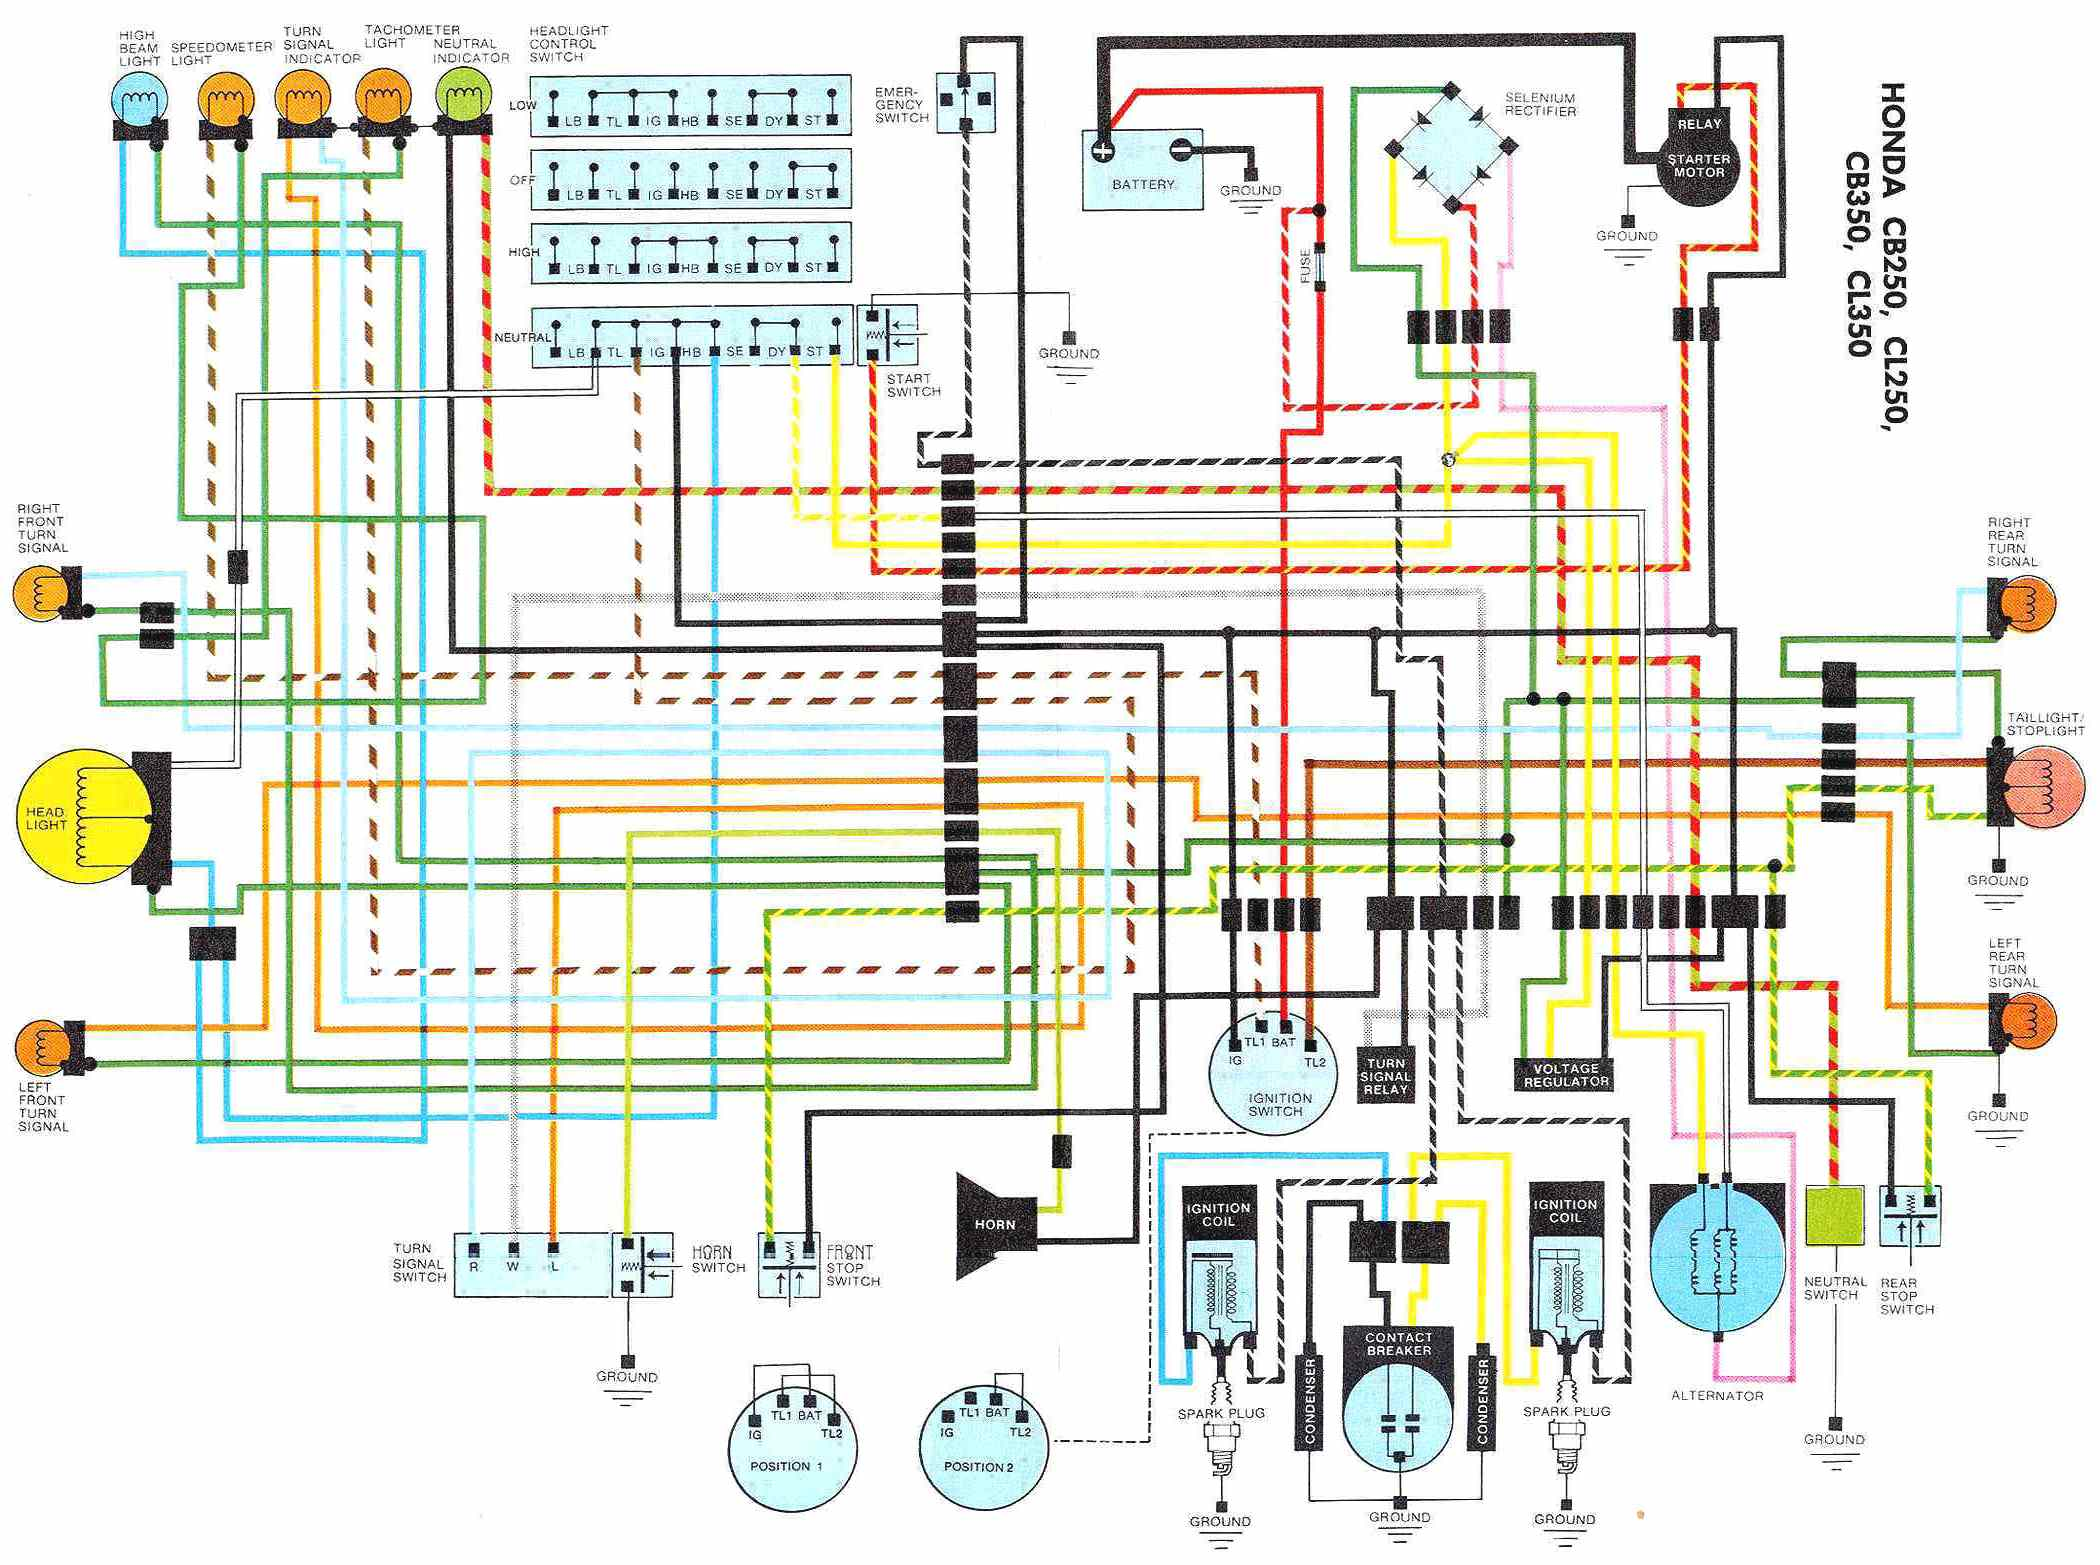 [SCHEMATICS_49CH]  Help needed with wiring repair - 1973 CL350 | Honda Twins | Honda Cb 125 T Wiring Diagram |  | Honda Twins